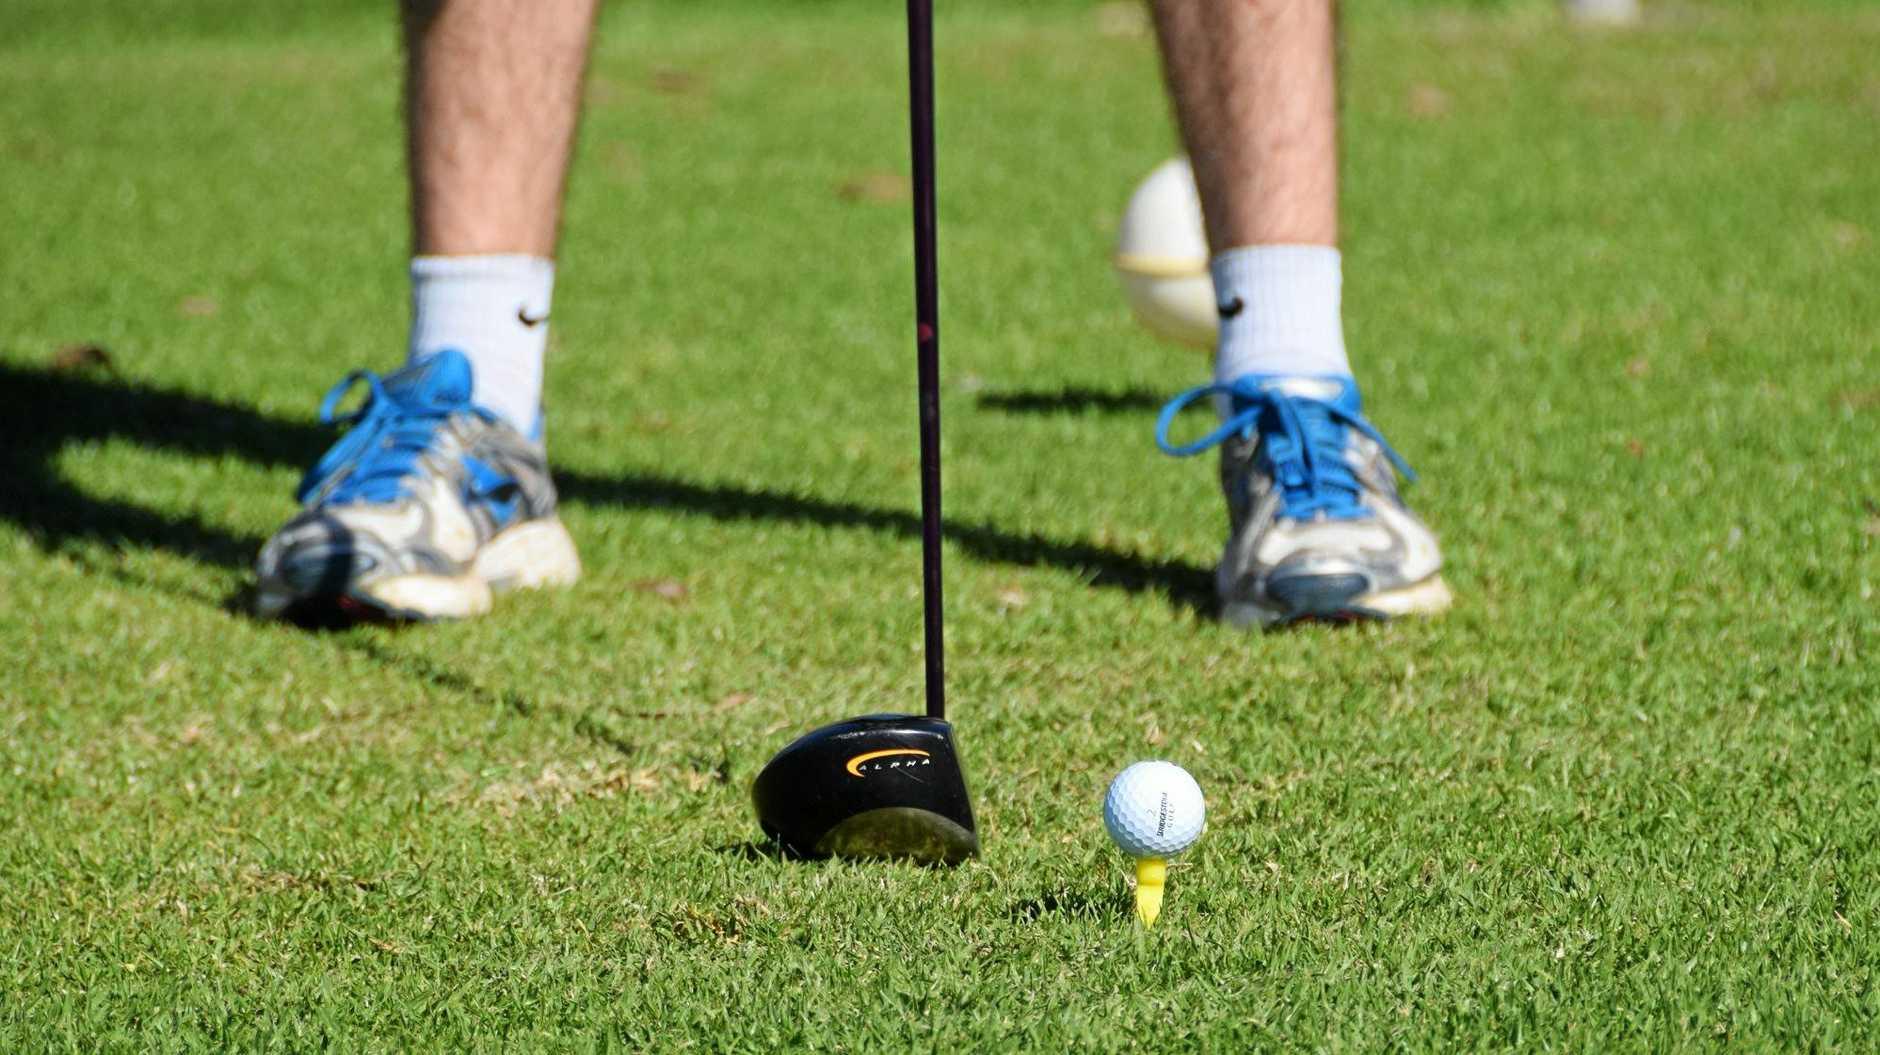 RESULTS: On Sunday, 57 golfers from Murgon, Nanango, Kingaroy, Kumbia, Goomeri, Crows Nest, Goombungee and Biloela played across four grades.